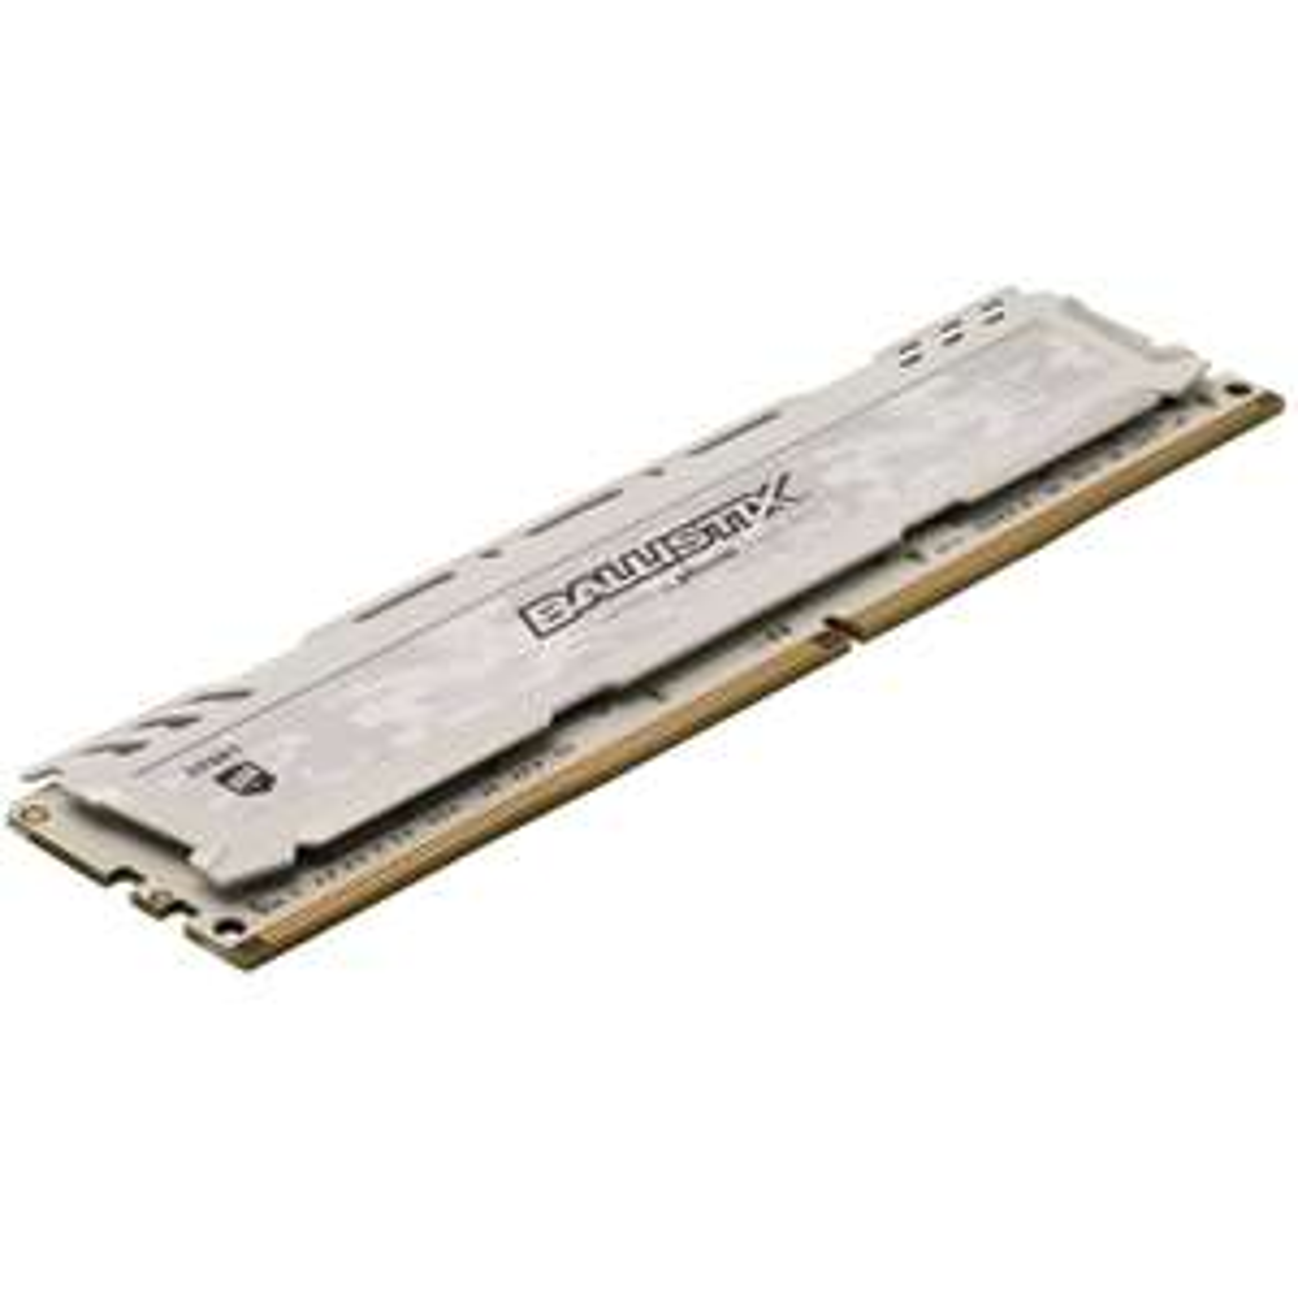 Ballistix Sport LT 16GB 3000MHz DDR4 RAM £56.96 @ Amazon Germany